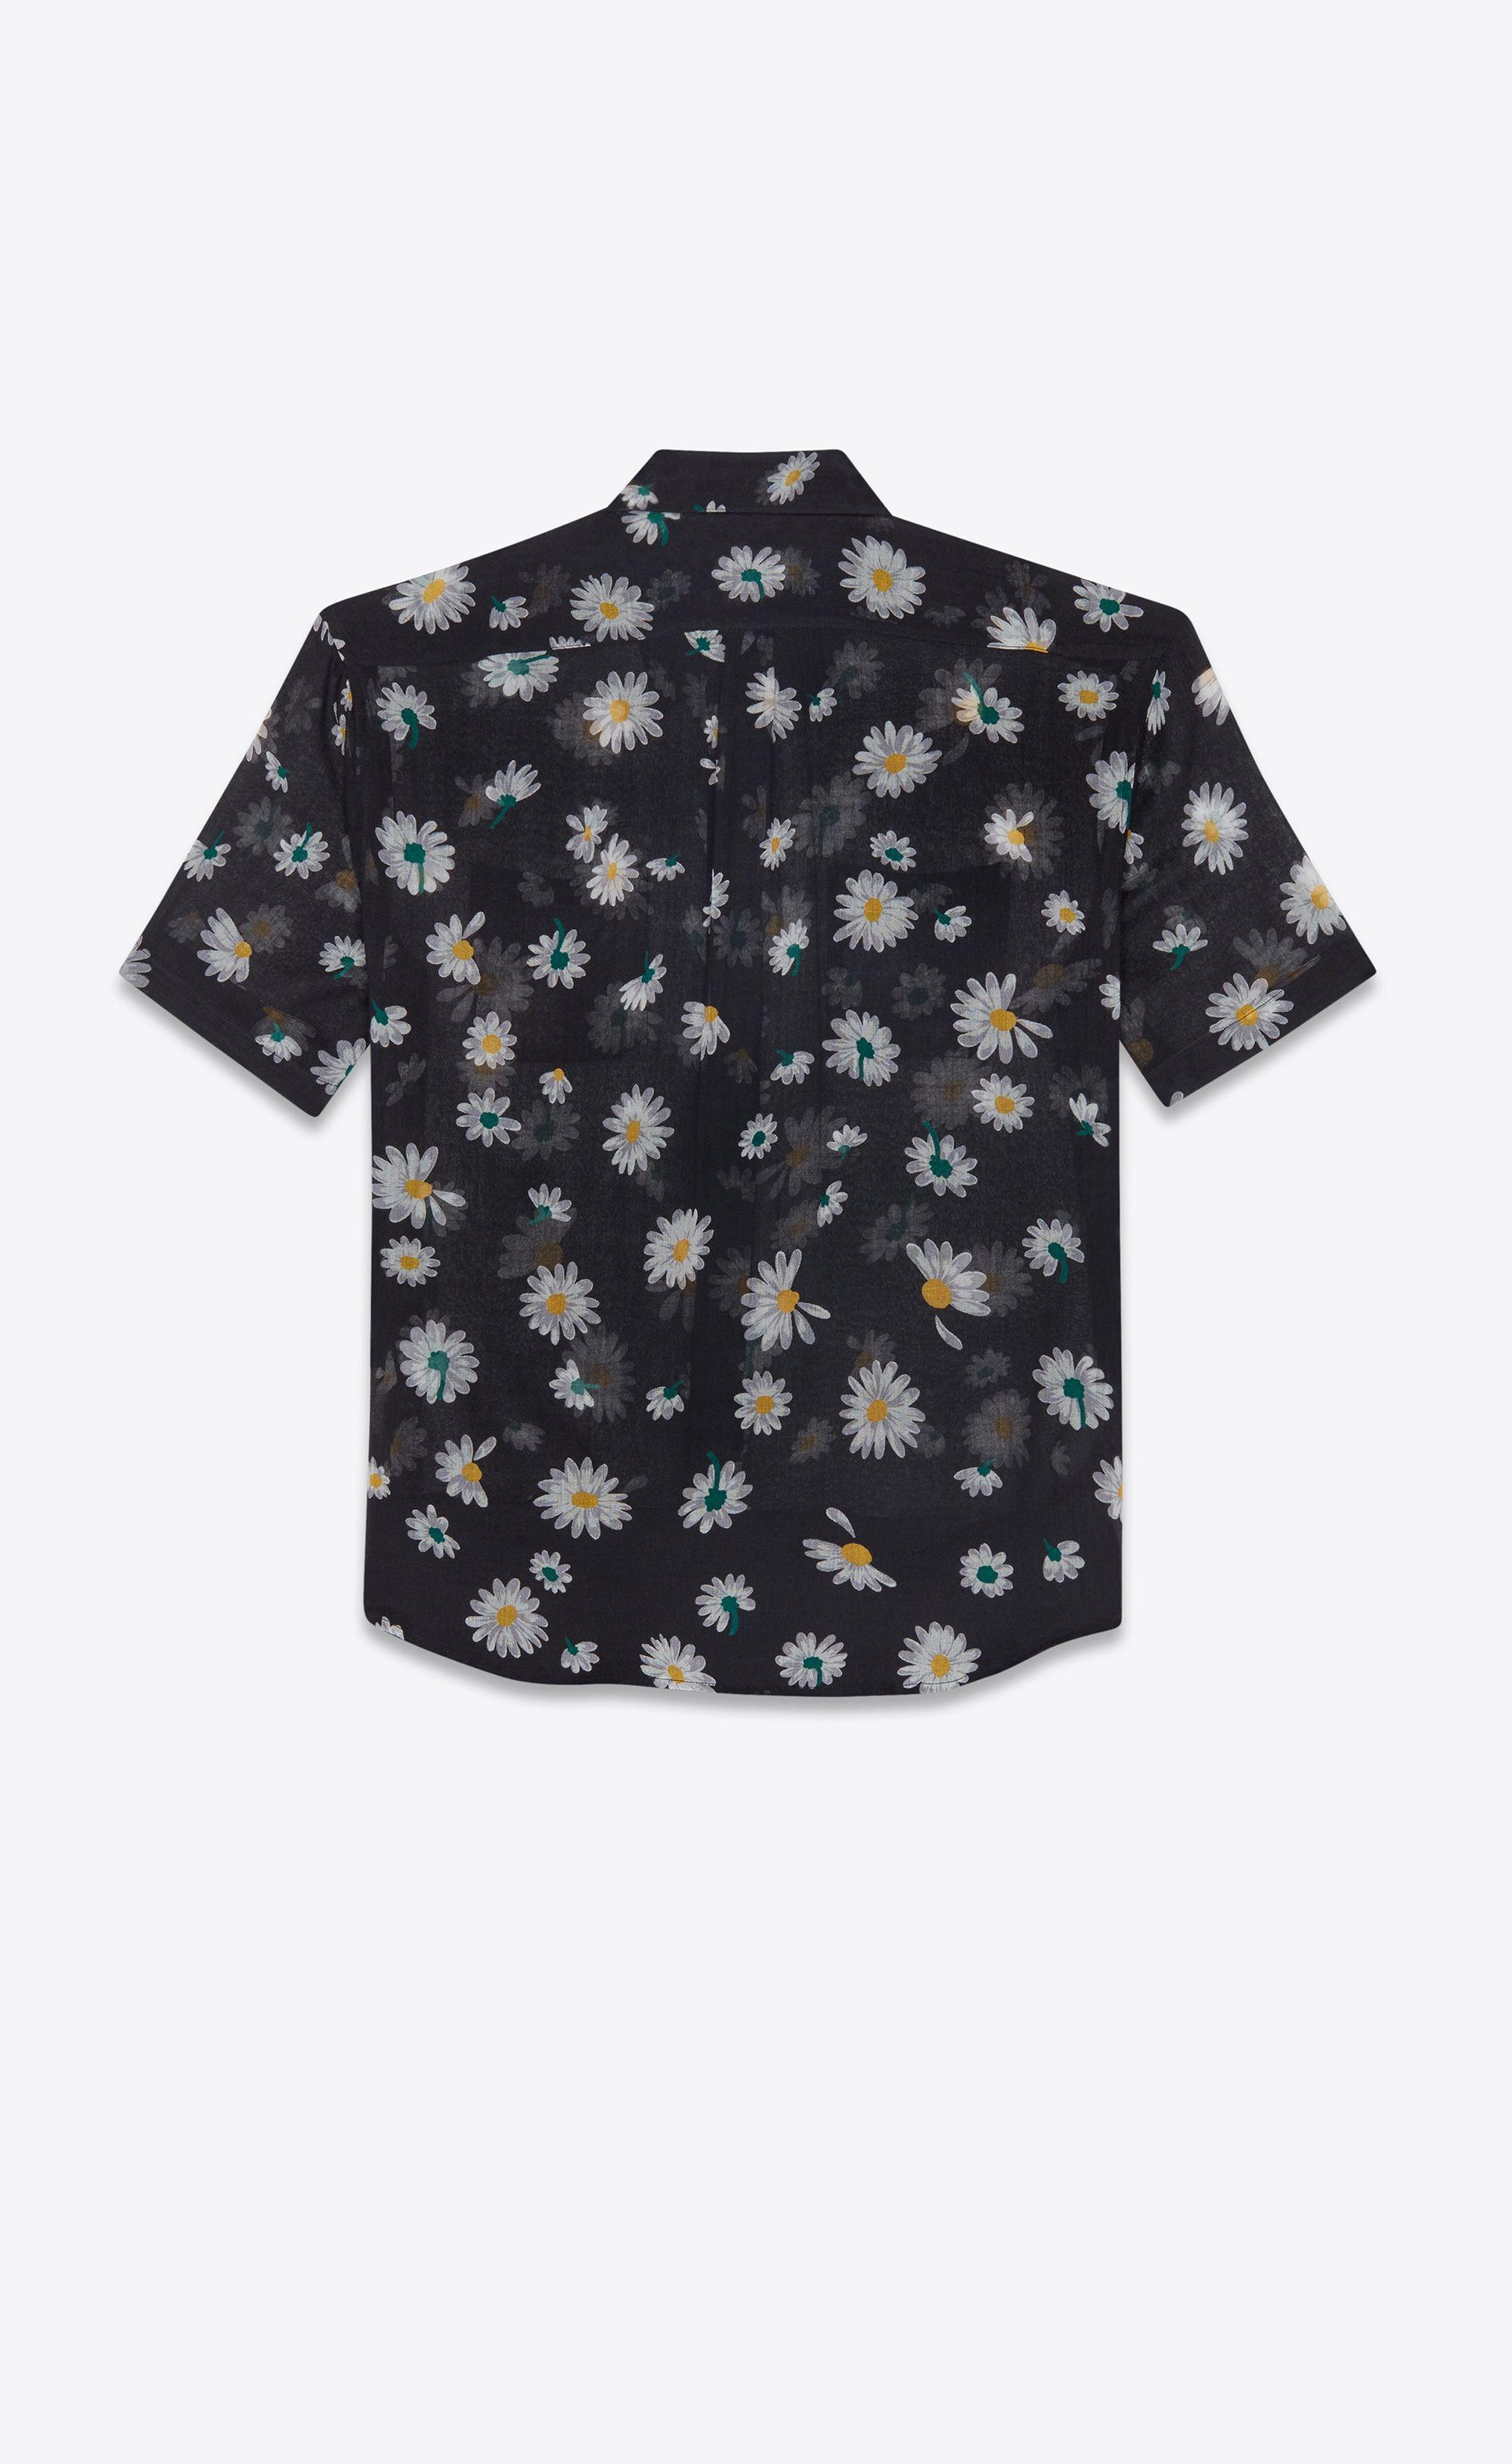 6b0204ee Saint Laurent Yves Collar Shirt In Black Etamine Printed With Daisies |  YSL.com